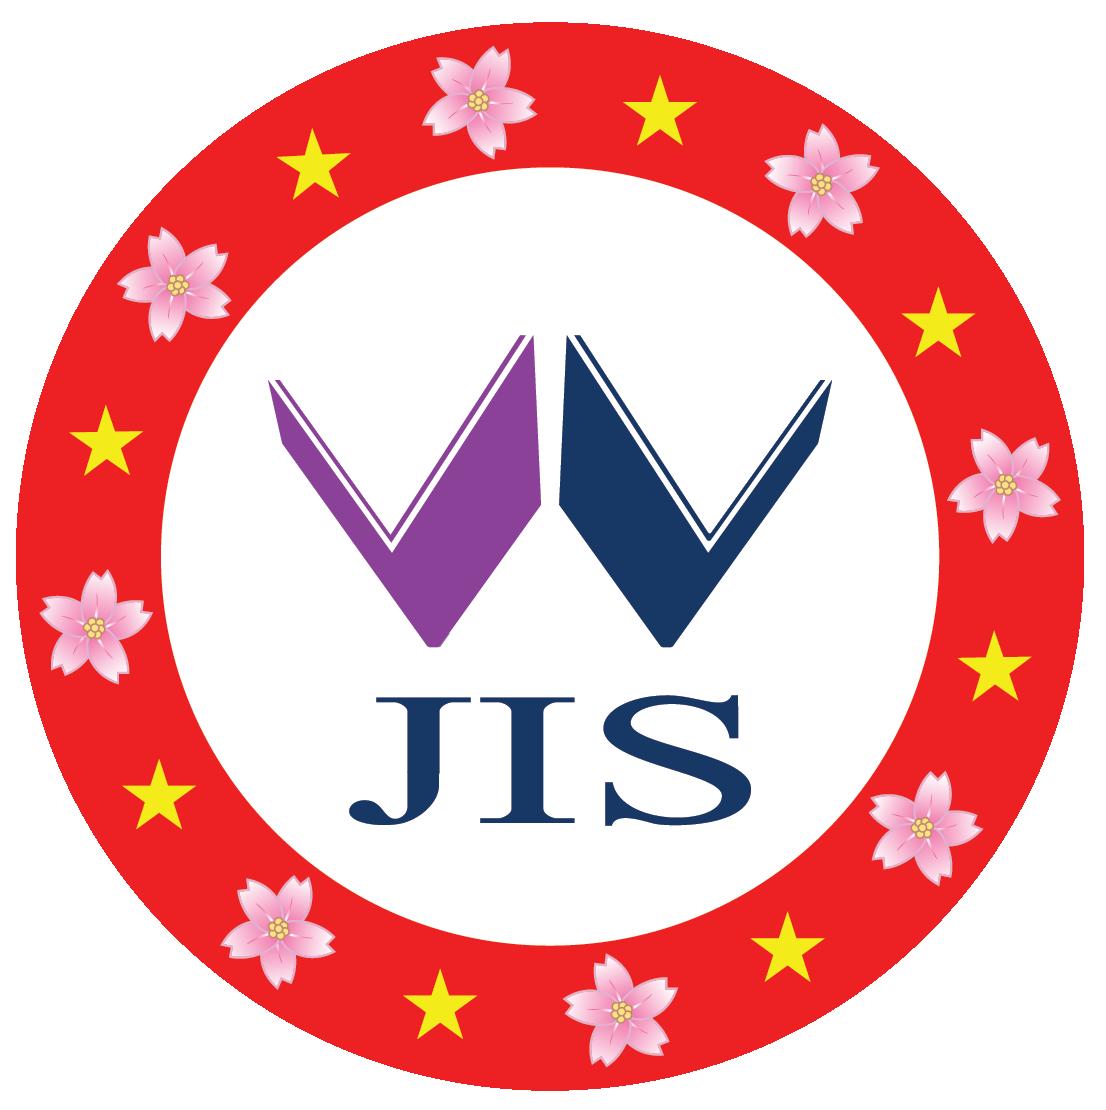 https://beetechgroup.com/wp-content/uploads/2021/10/logo-JIS.png